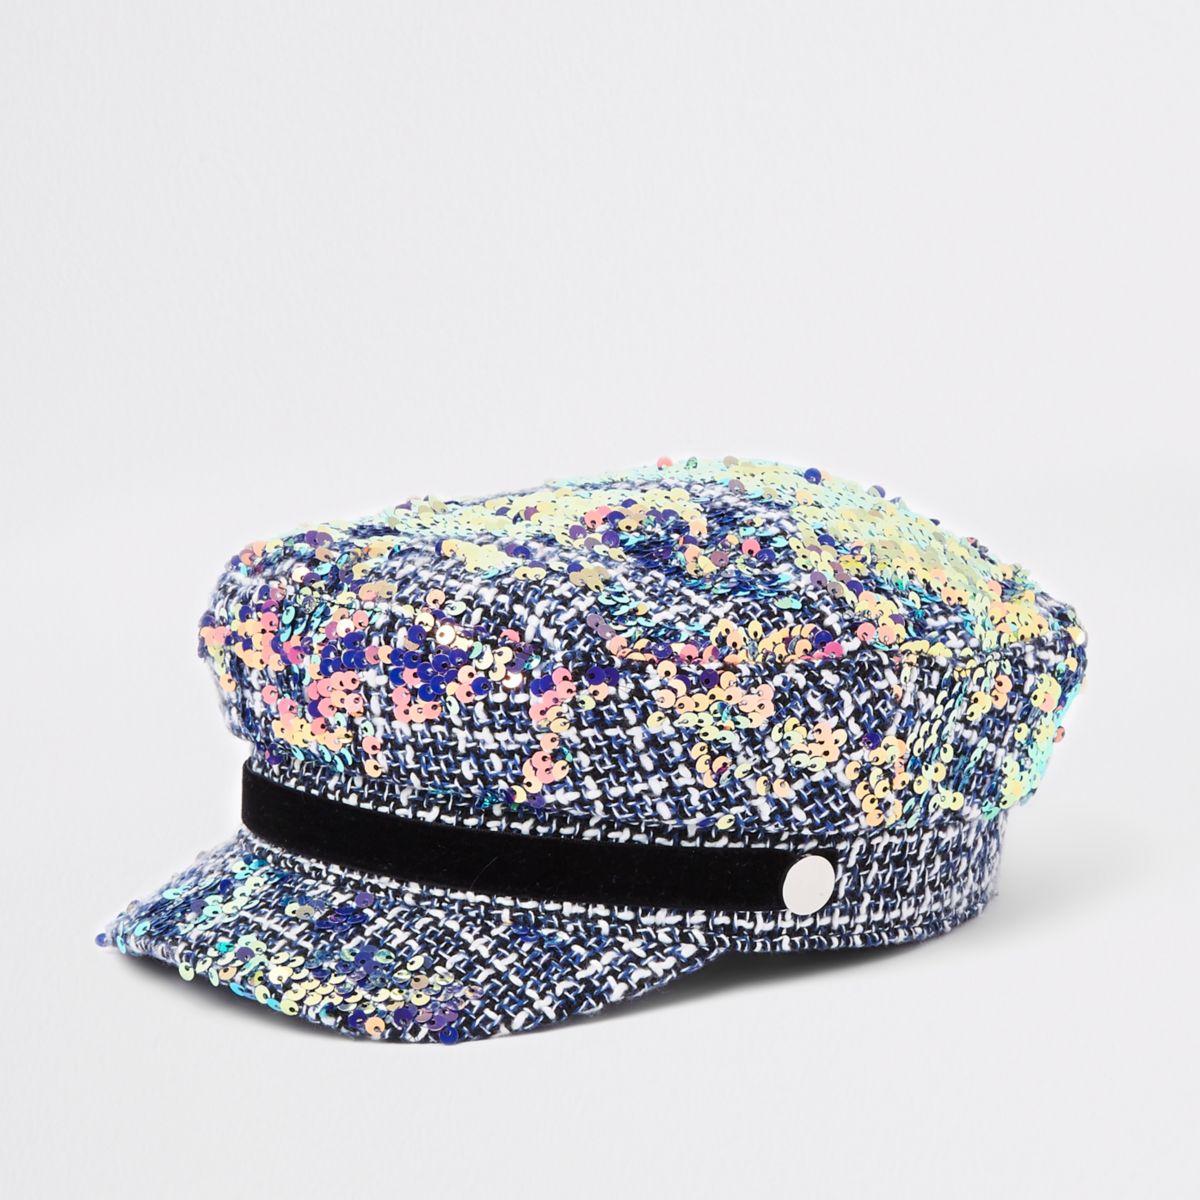 5440046581e Girls grey boucle sequin captains hat - Hats - Accessories - girls